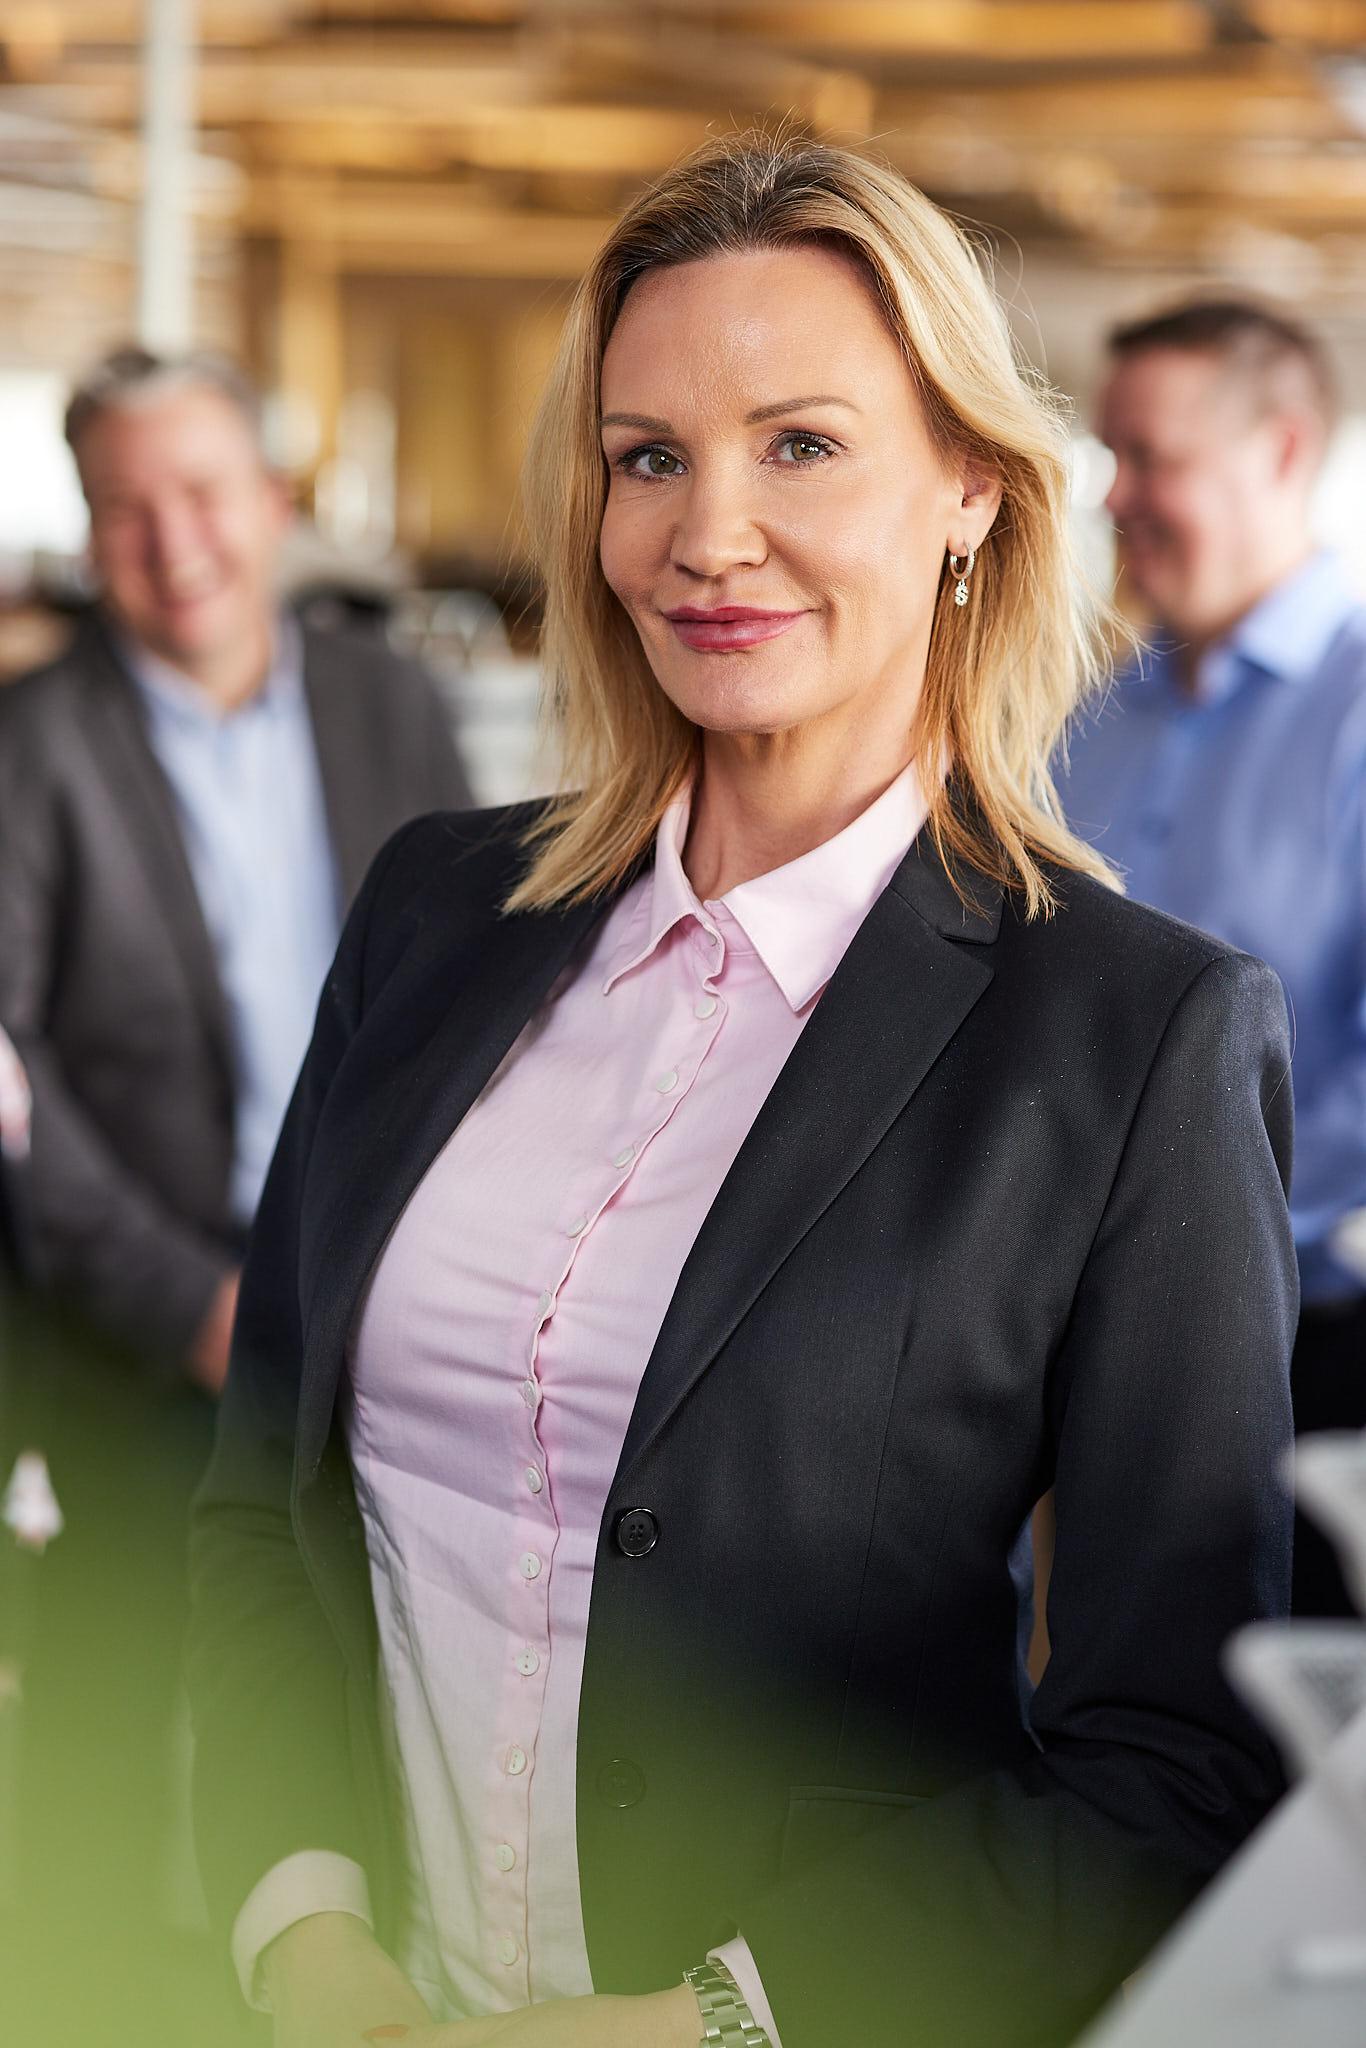 Sandra Löwfgren